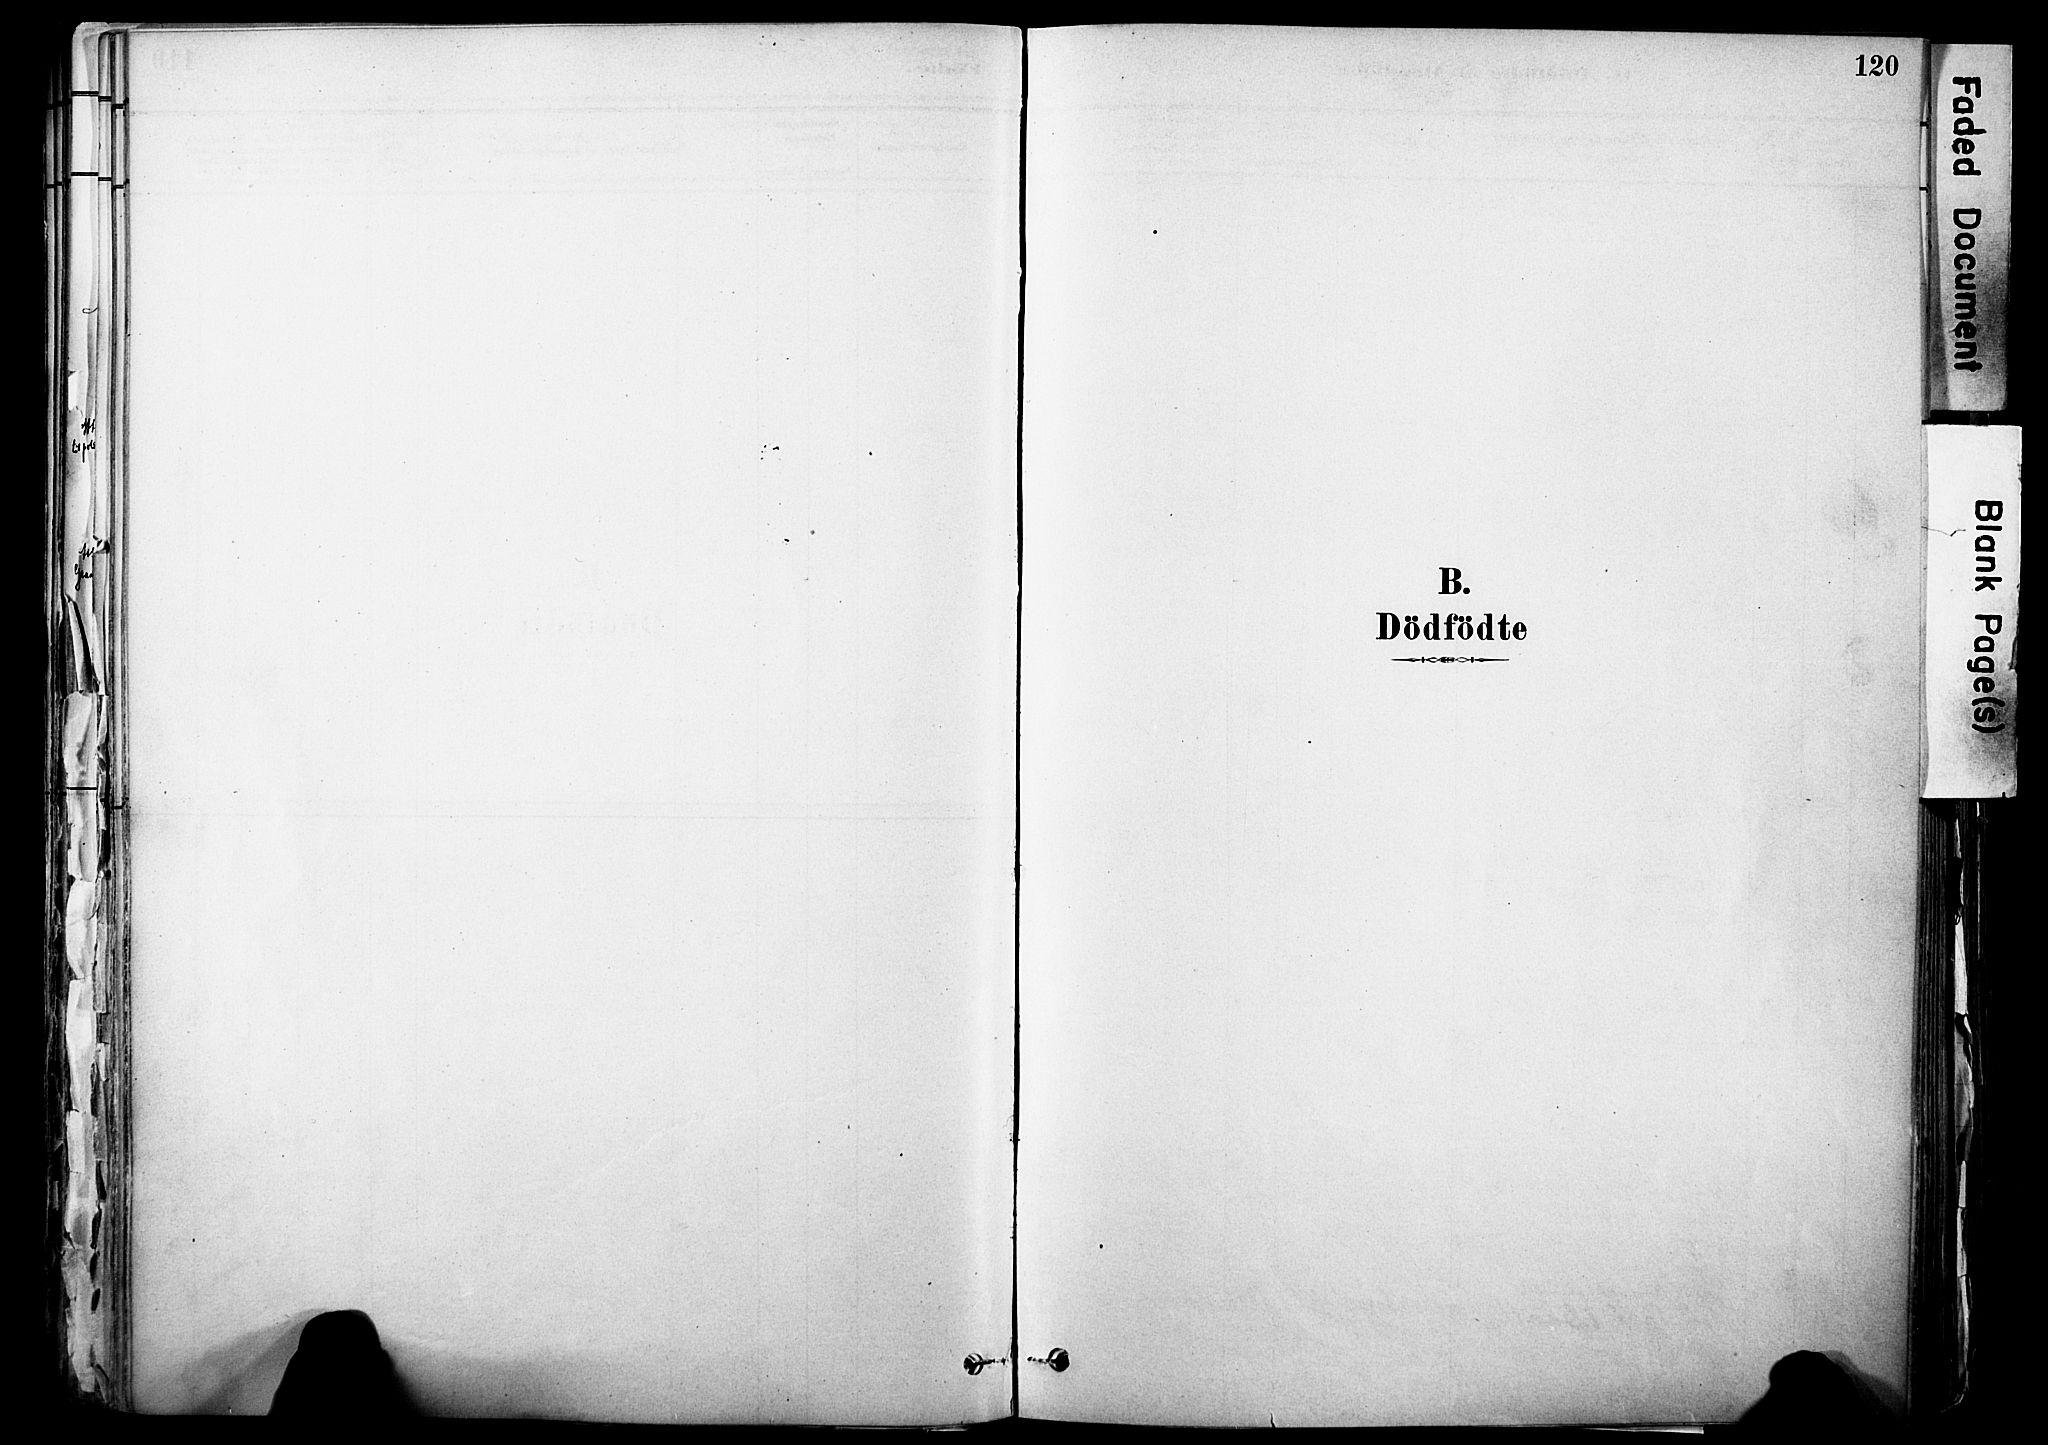 SAH, Skjåk prestekontor, Ministerialbok nr. 3, 1880-1907, s. 120